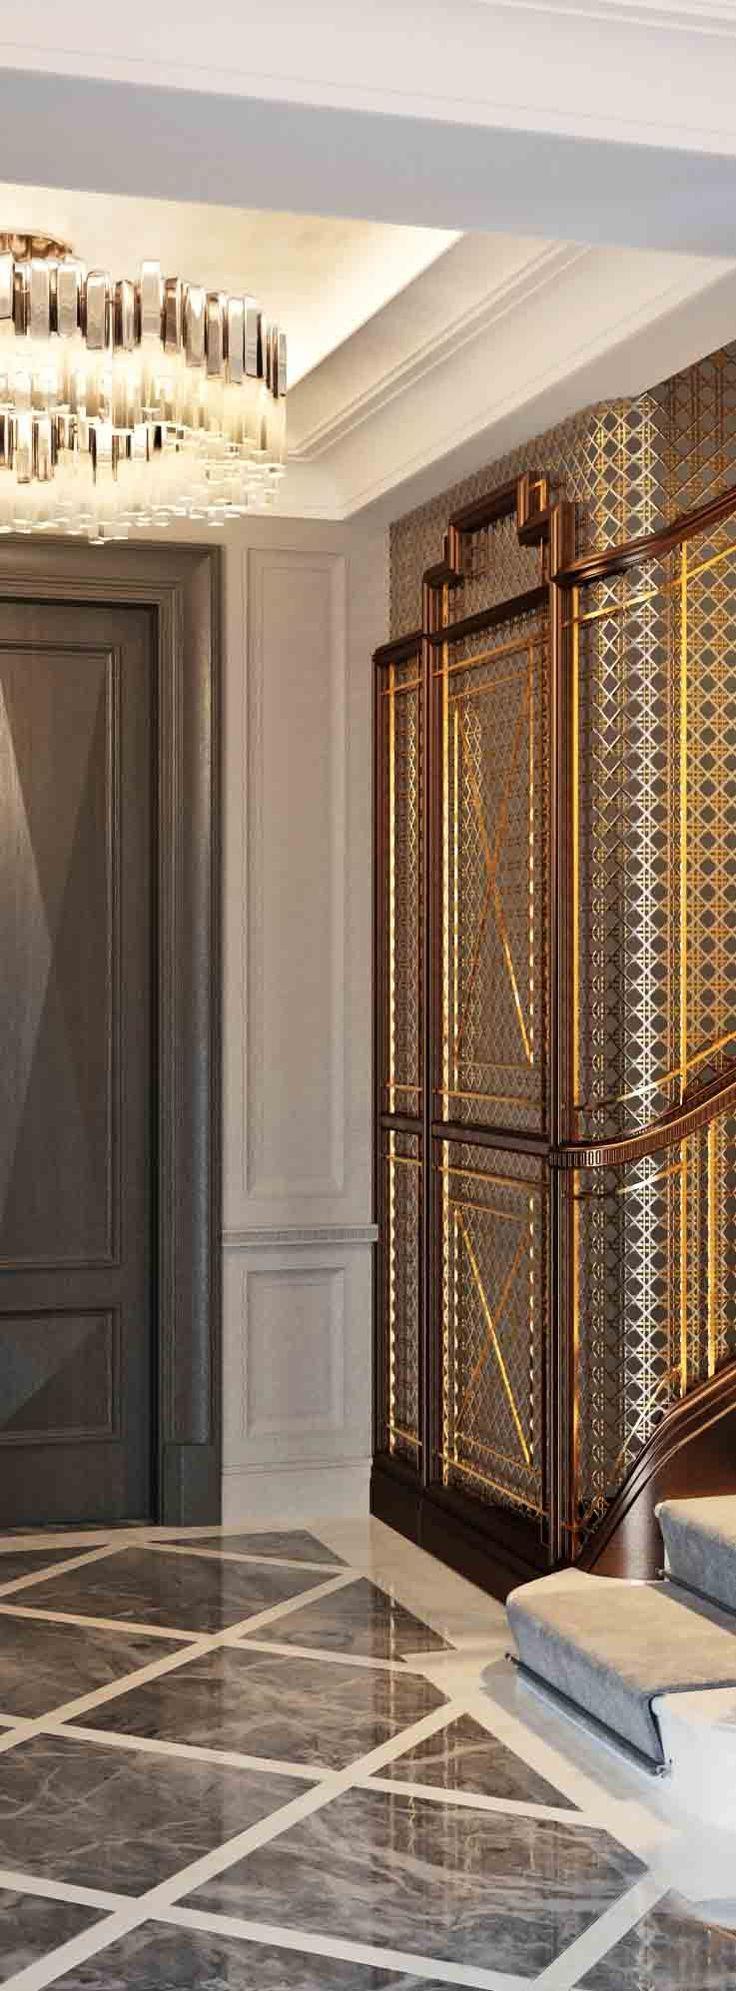 Best 25 elevator lobby ideas on pinterest elevator for Elevator flooring options